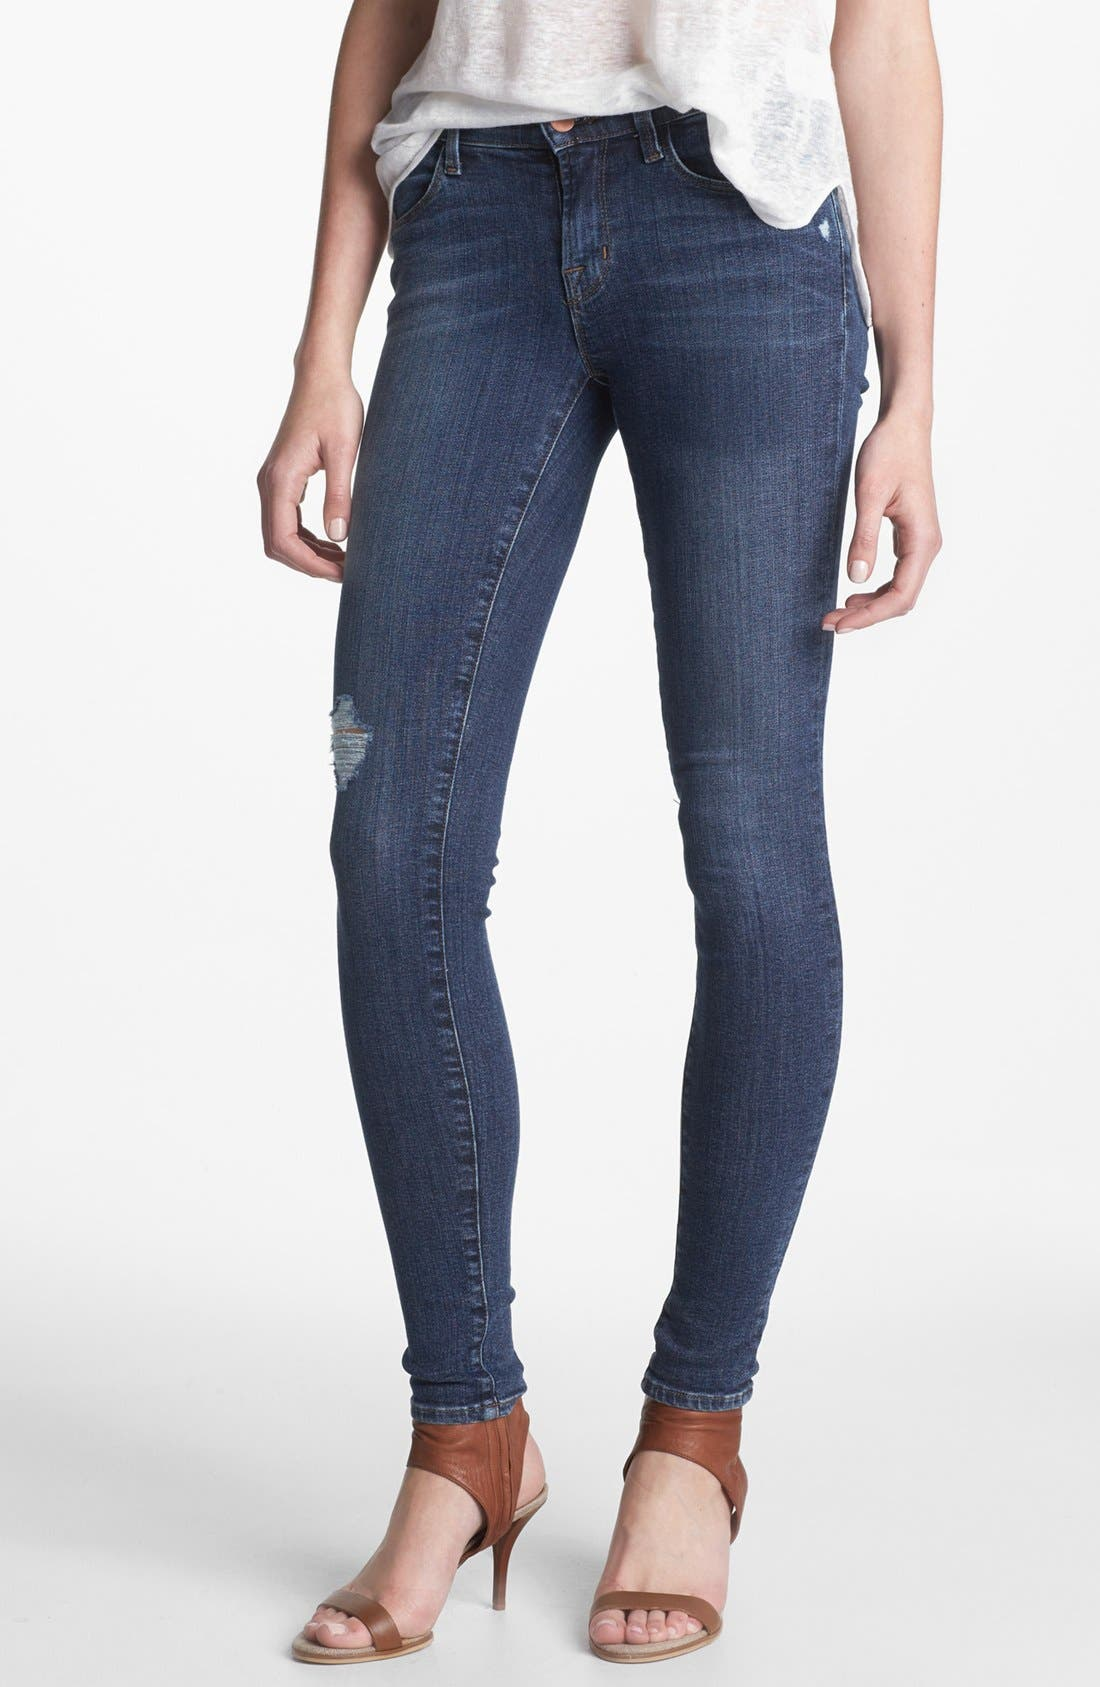 Alternate Image 1 Selected - J Brand '620' Mid-Rise Skinny Jeans (Quantum)